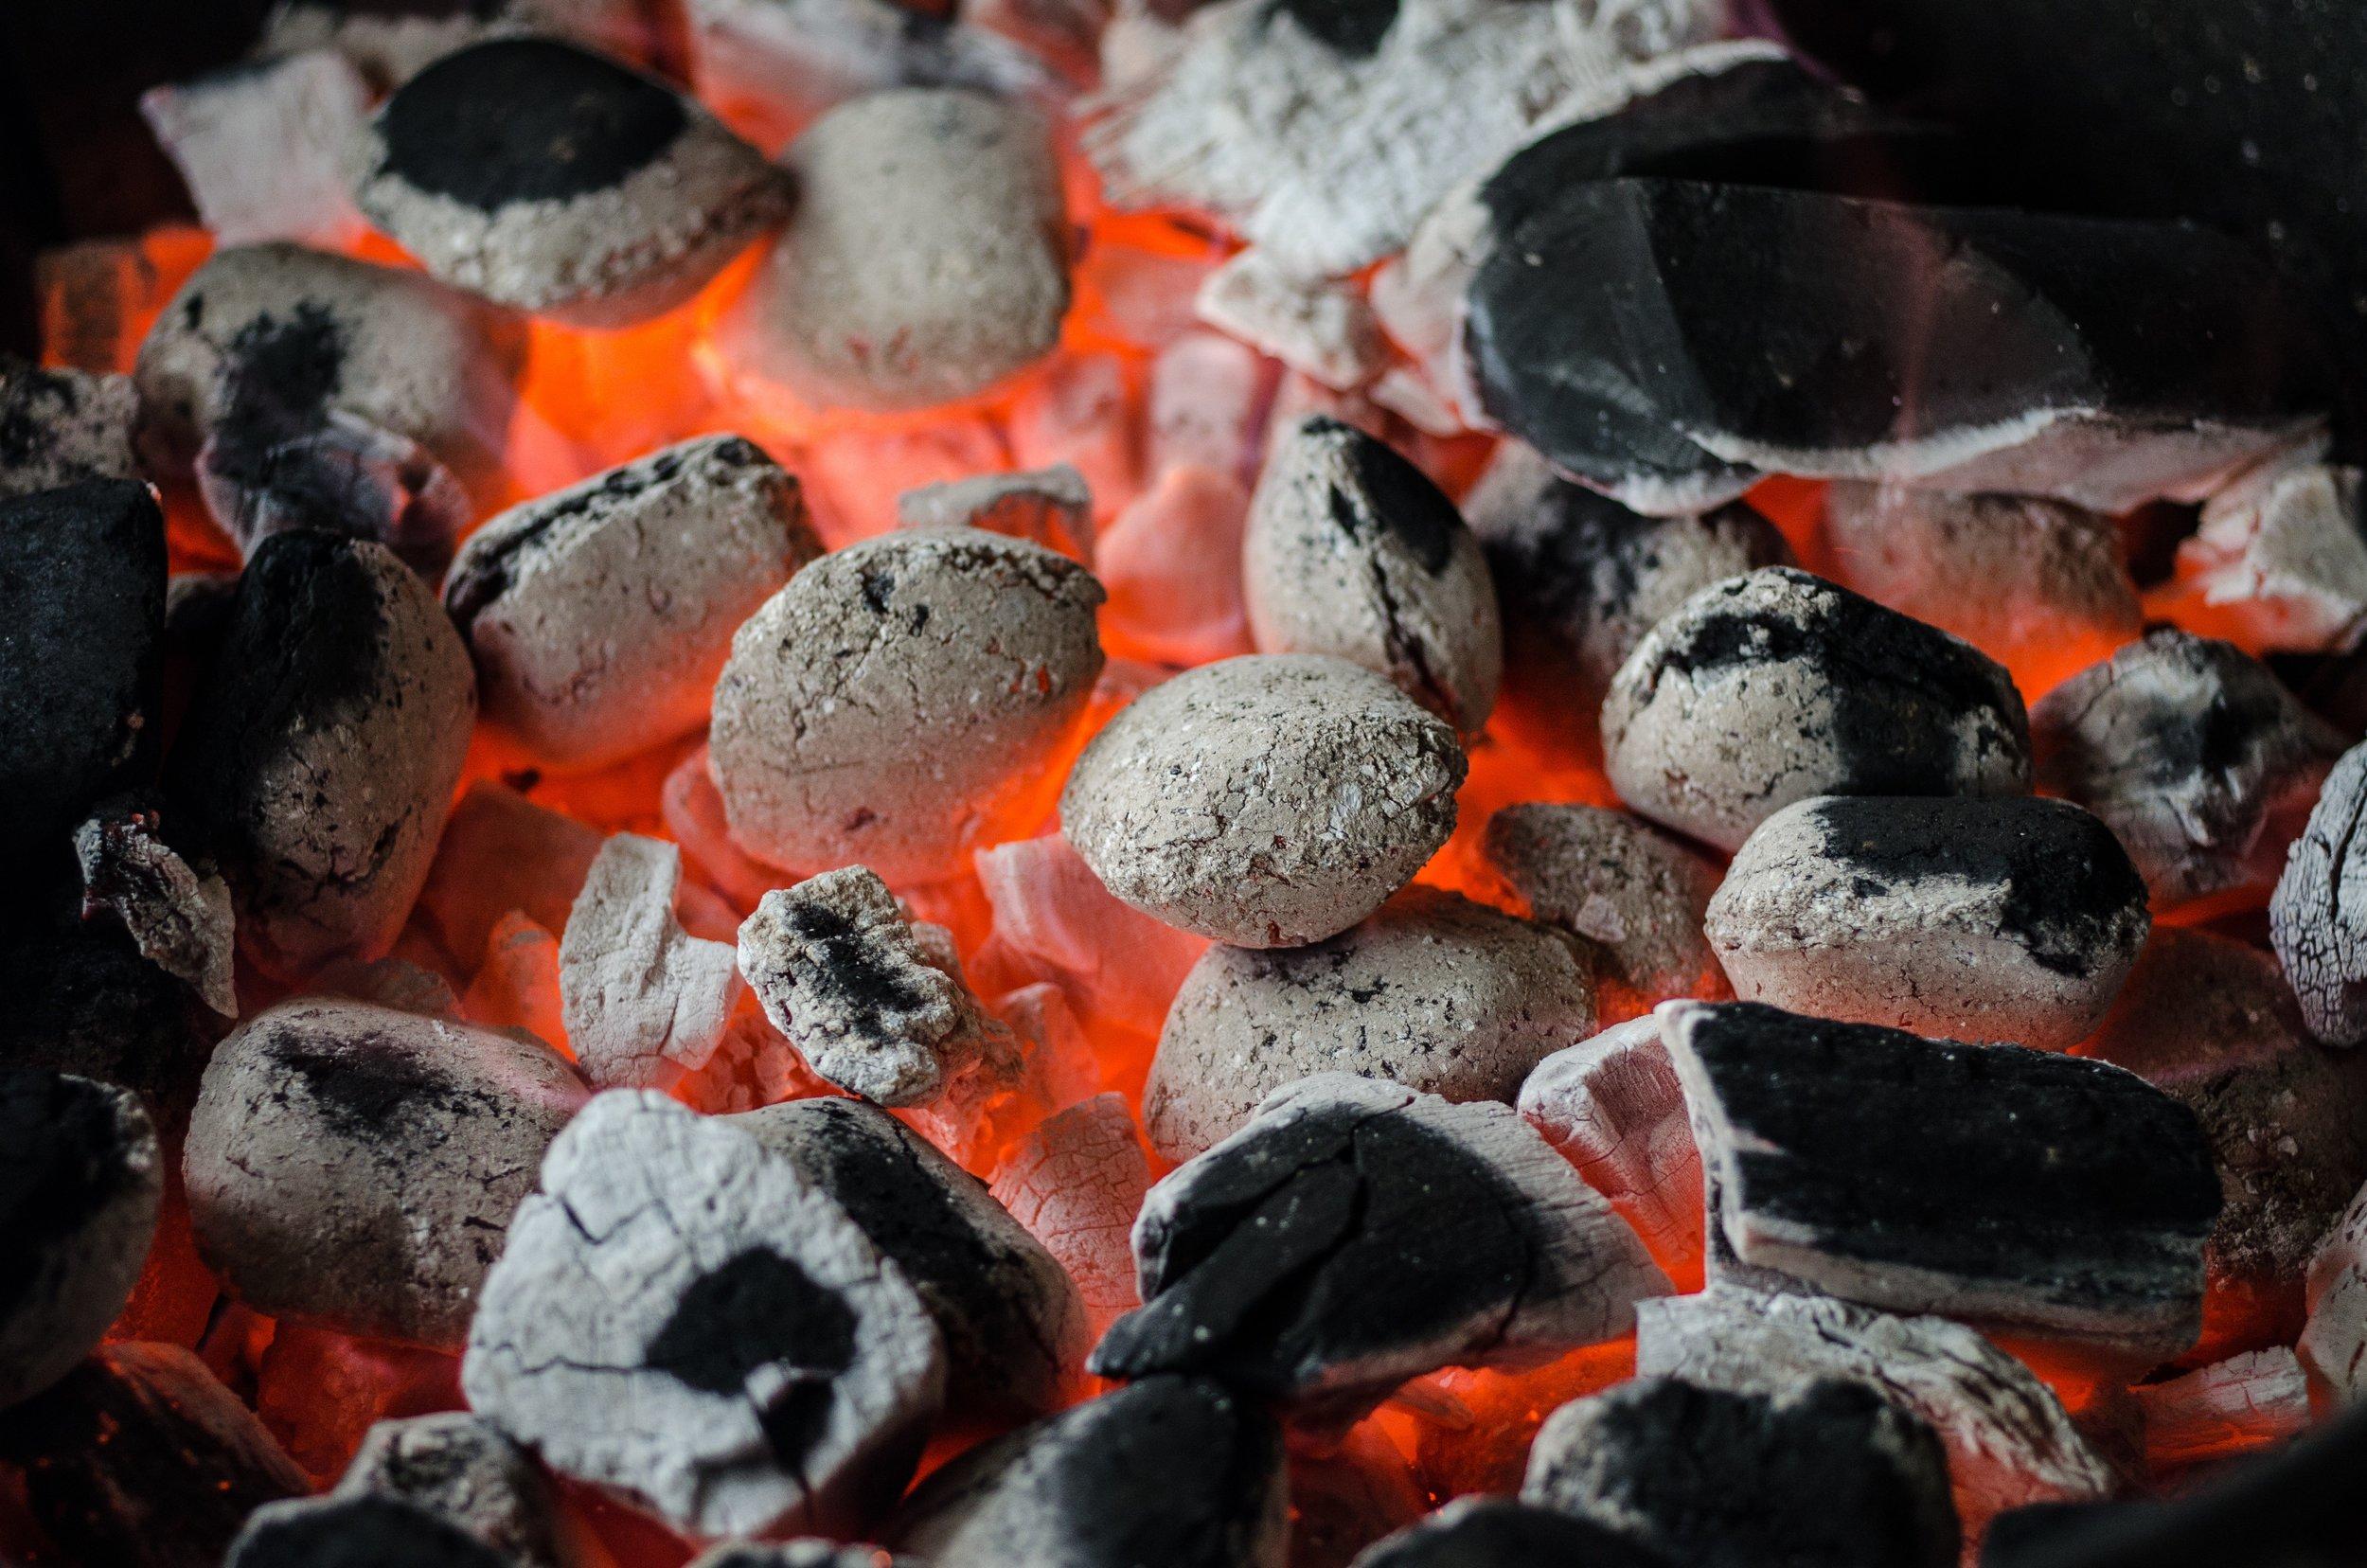 barbecue-bbq-briquettes-9263.jpg